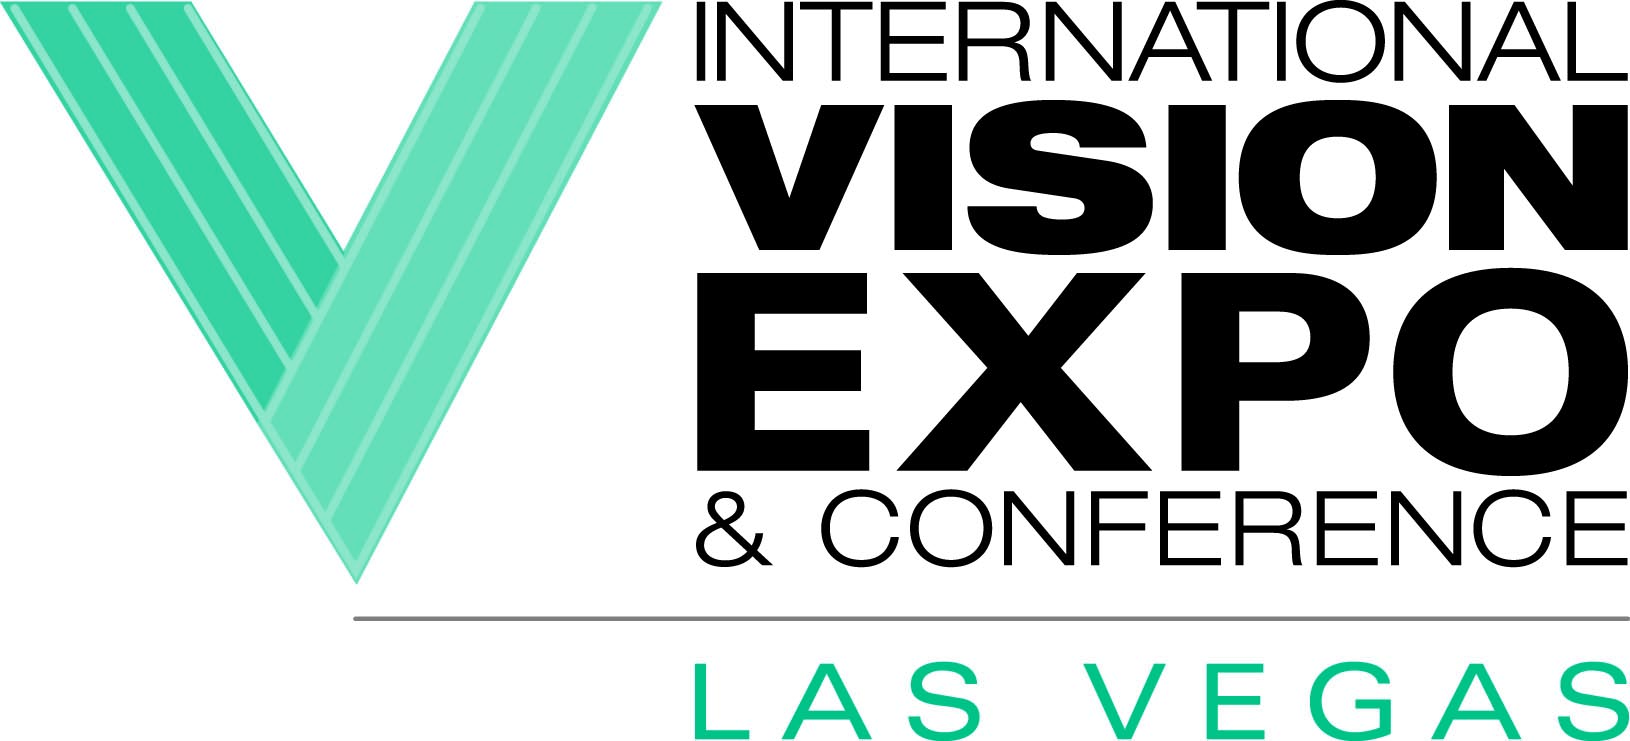 VisionExpoWest Logo_4C_LV_teal